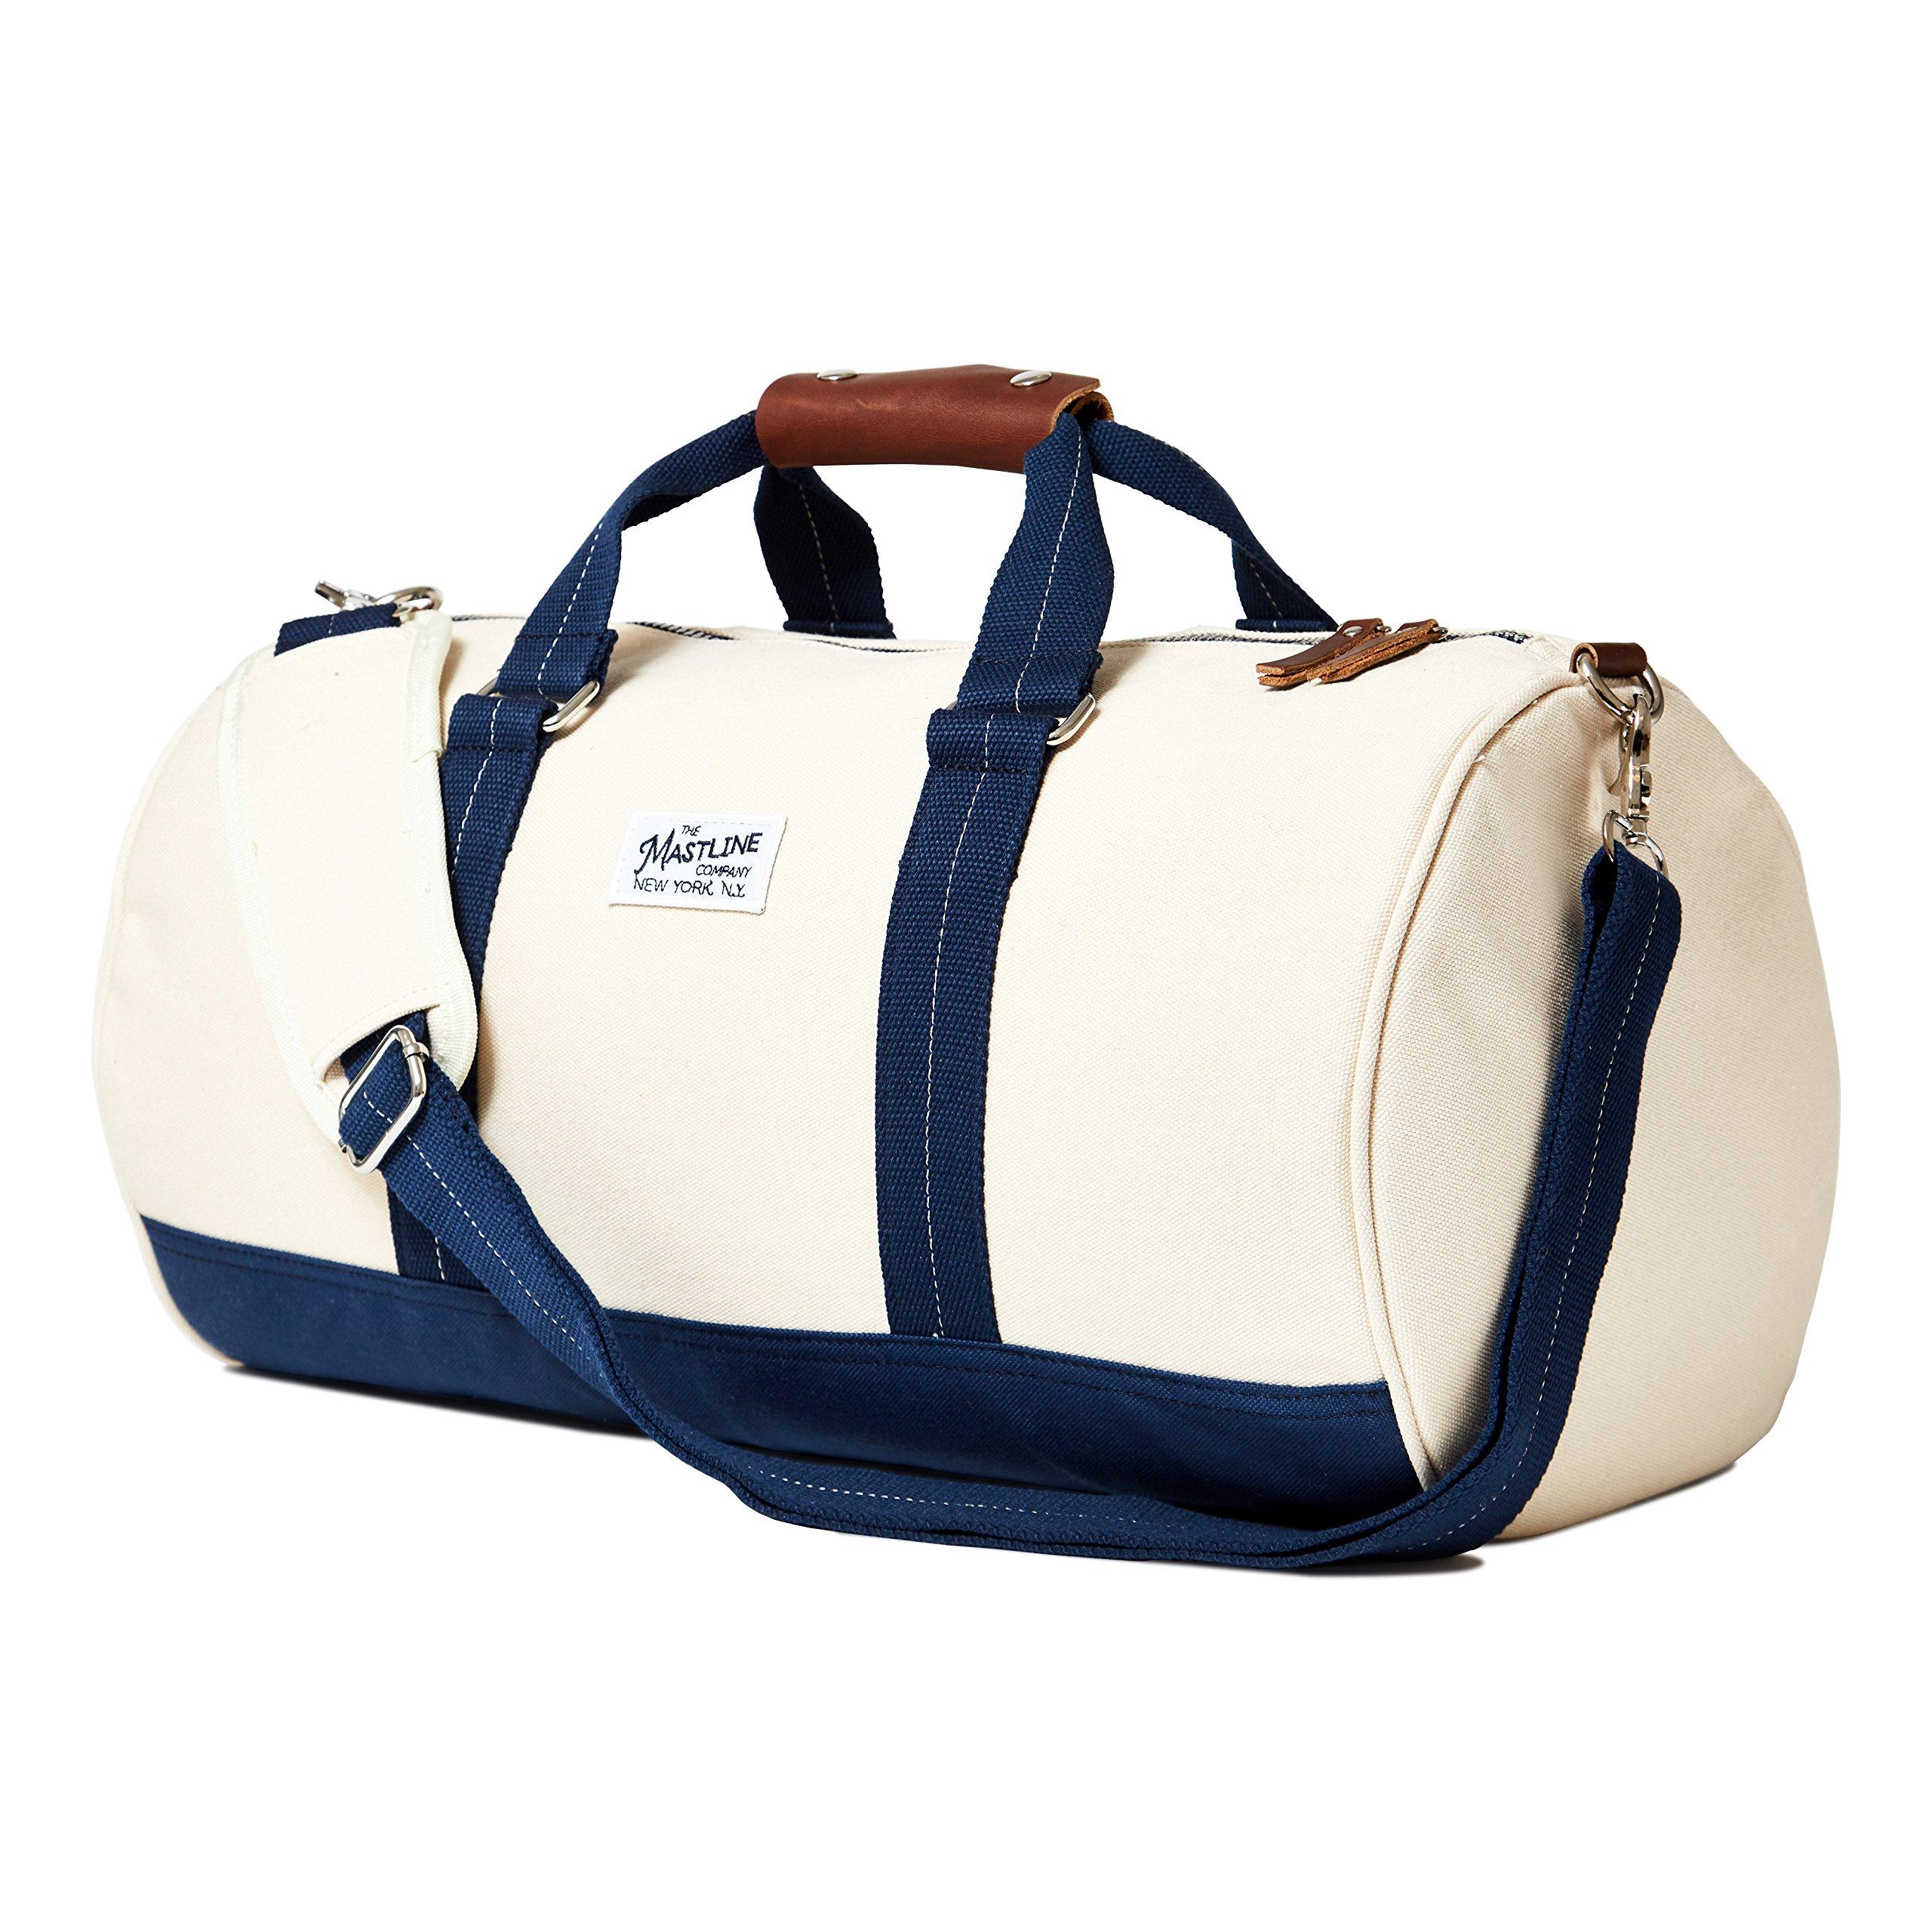 THE MASTLINE Co. | Hudson Barrel Duffel Travel Bag | Canvas & Leather (Natural White) by THE MASTLINE Co. (Image #1)